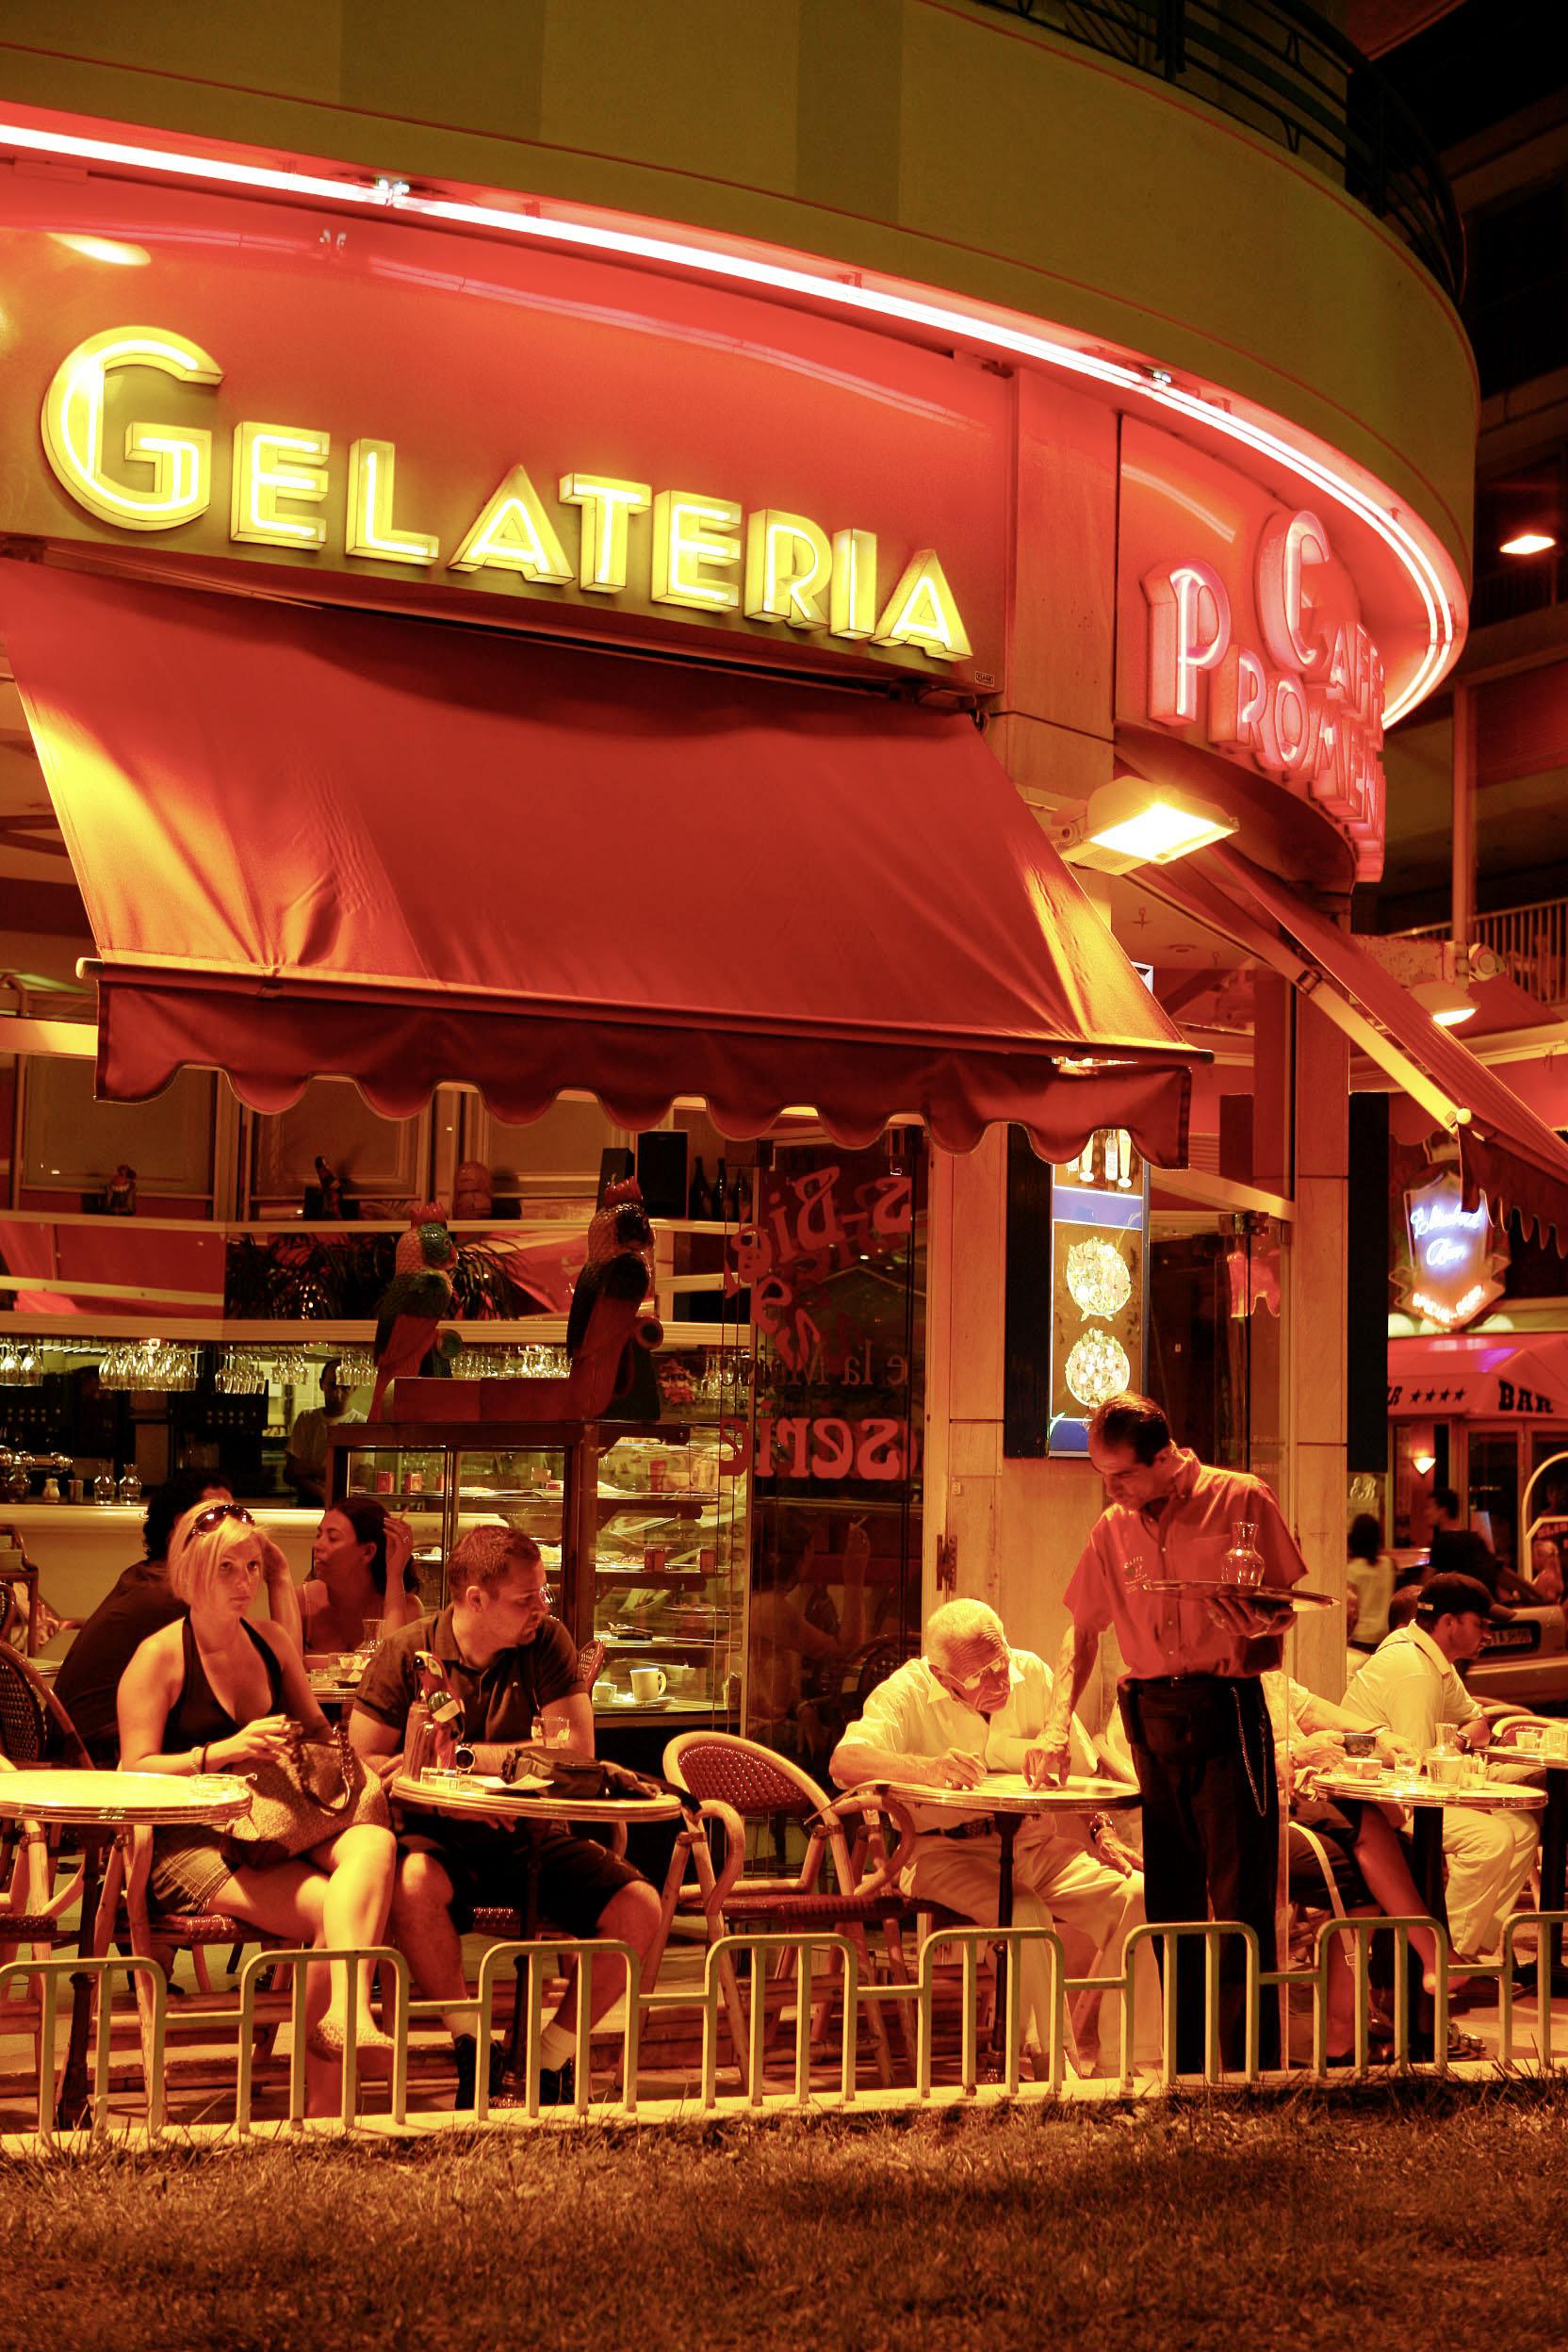 France, Cote d´Azur, Nice, Cafe Promenade at the Promenade des Anglais  ©  Reiner Riedler / Anzenberger